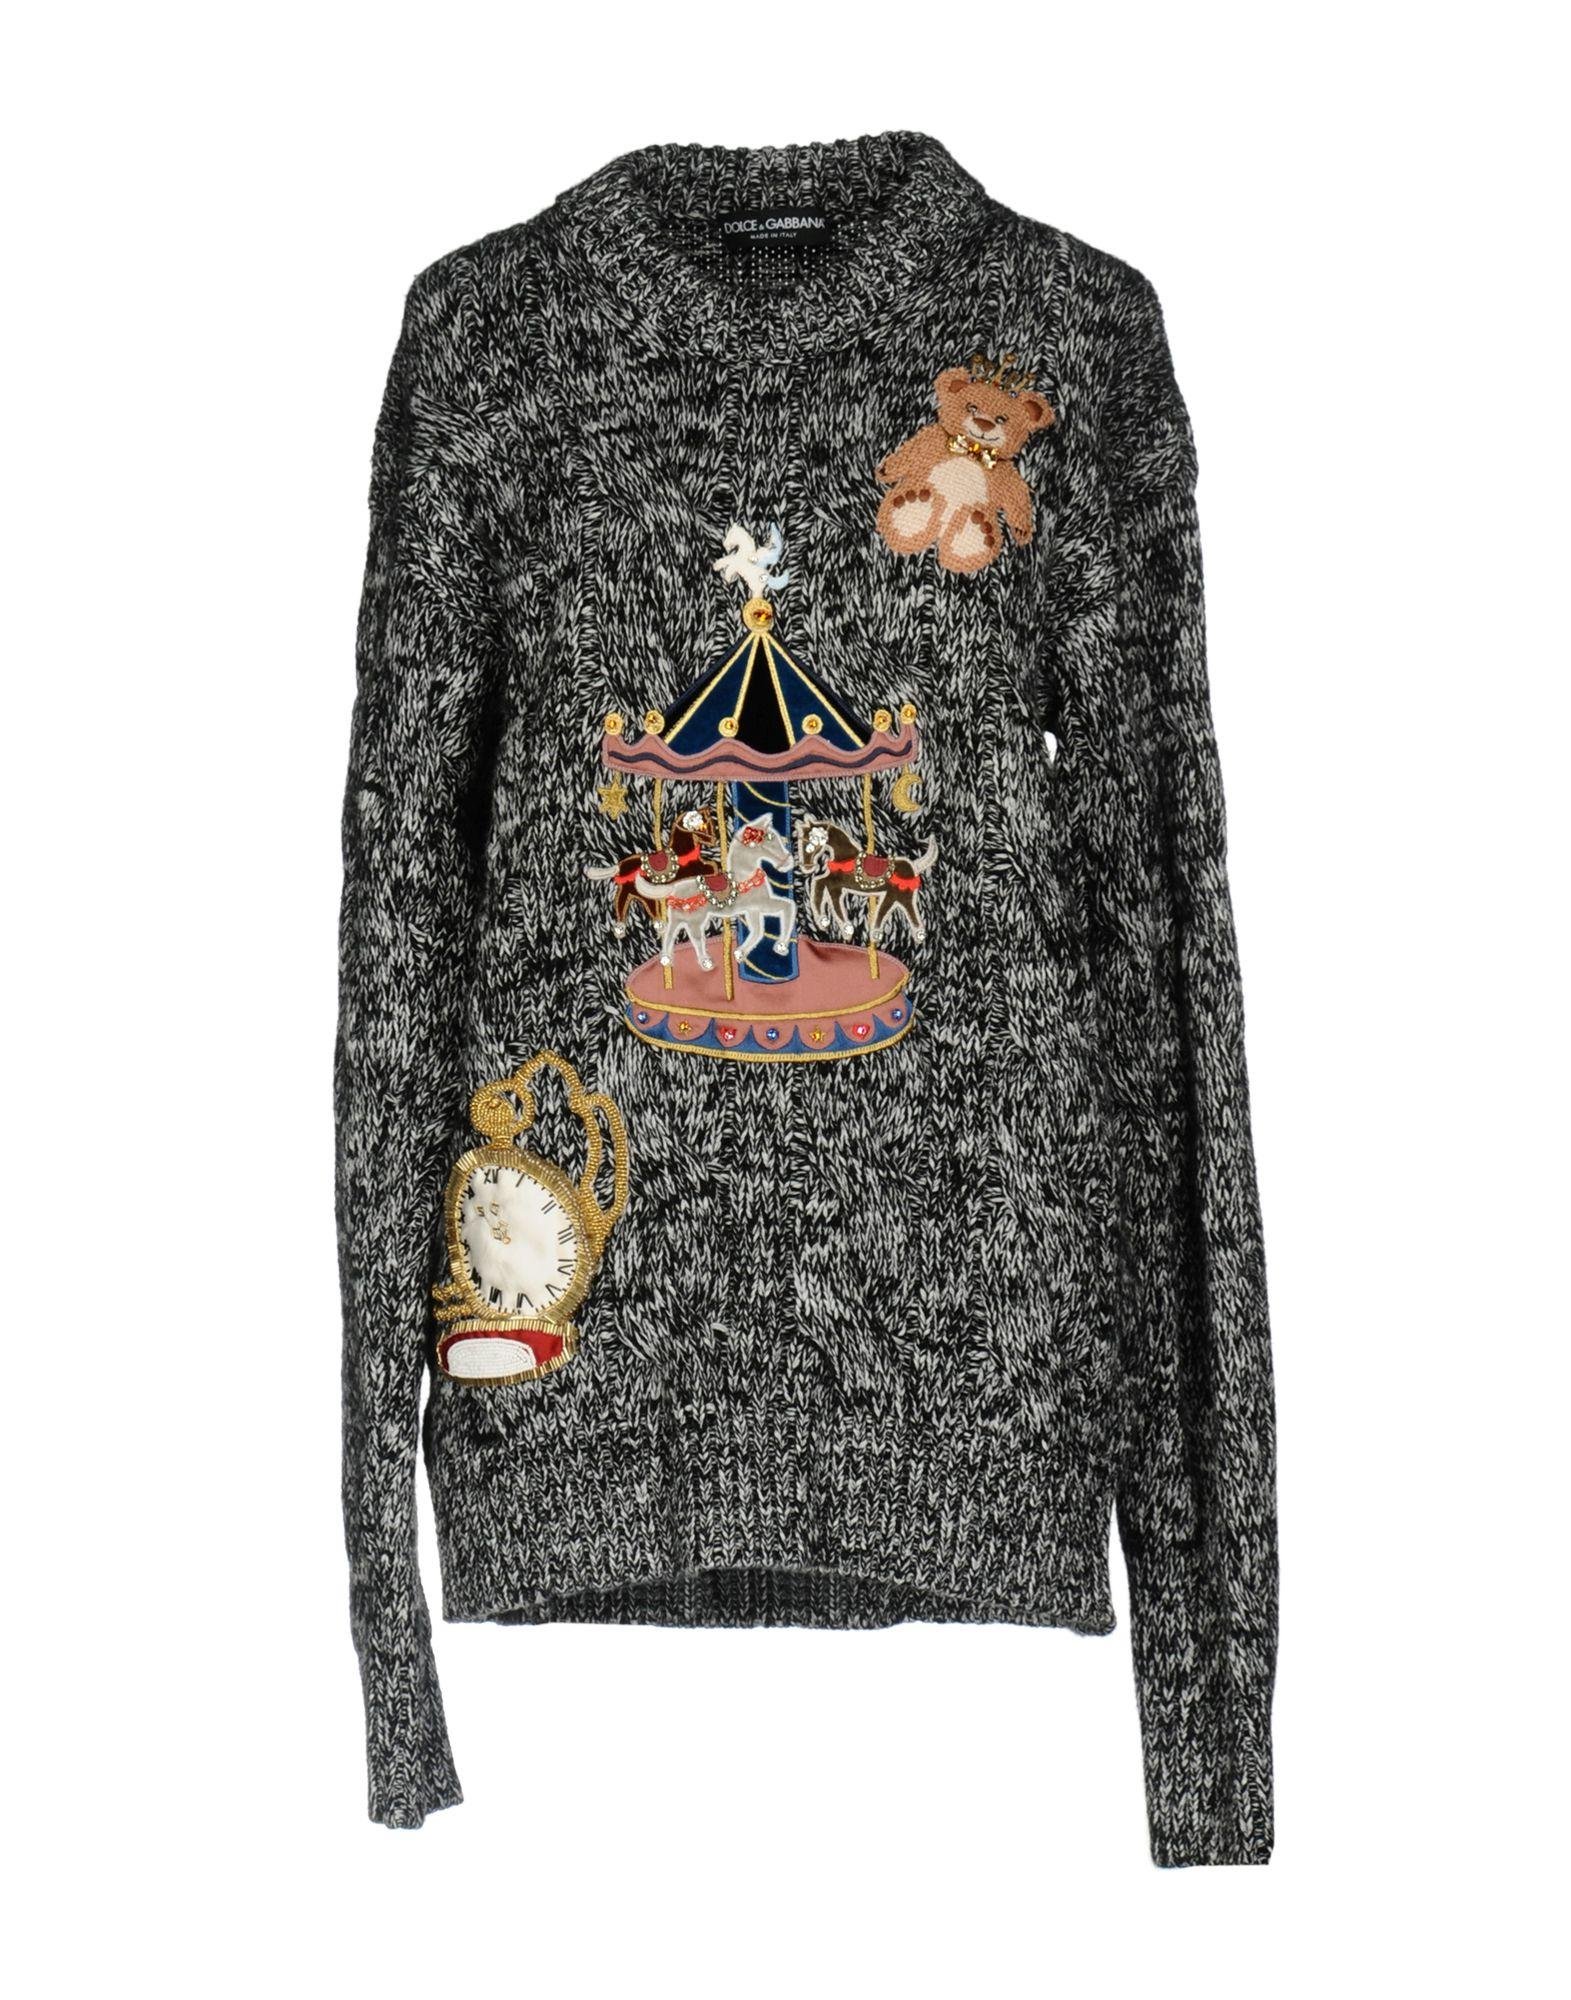 Dolce & Gabbana Cashmere Blend In Black